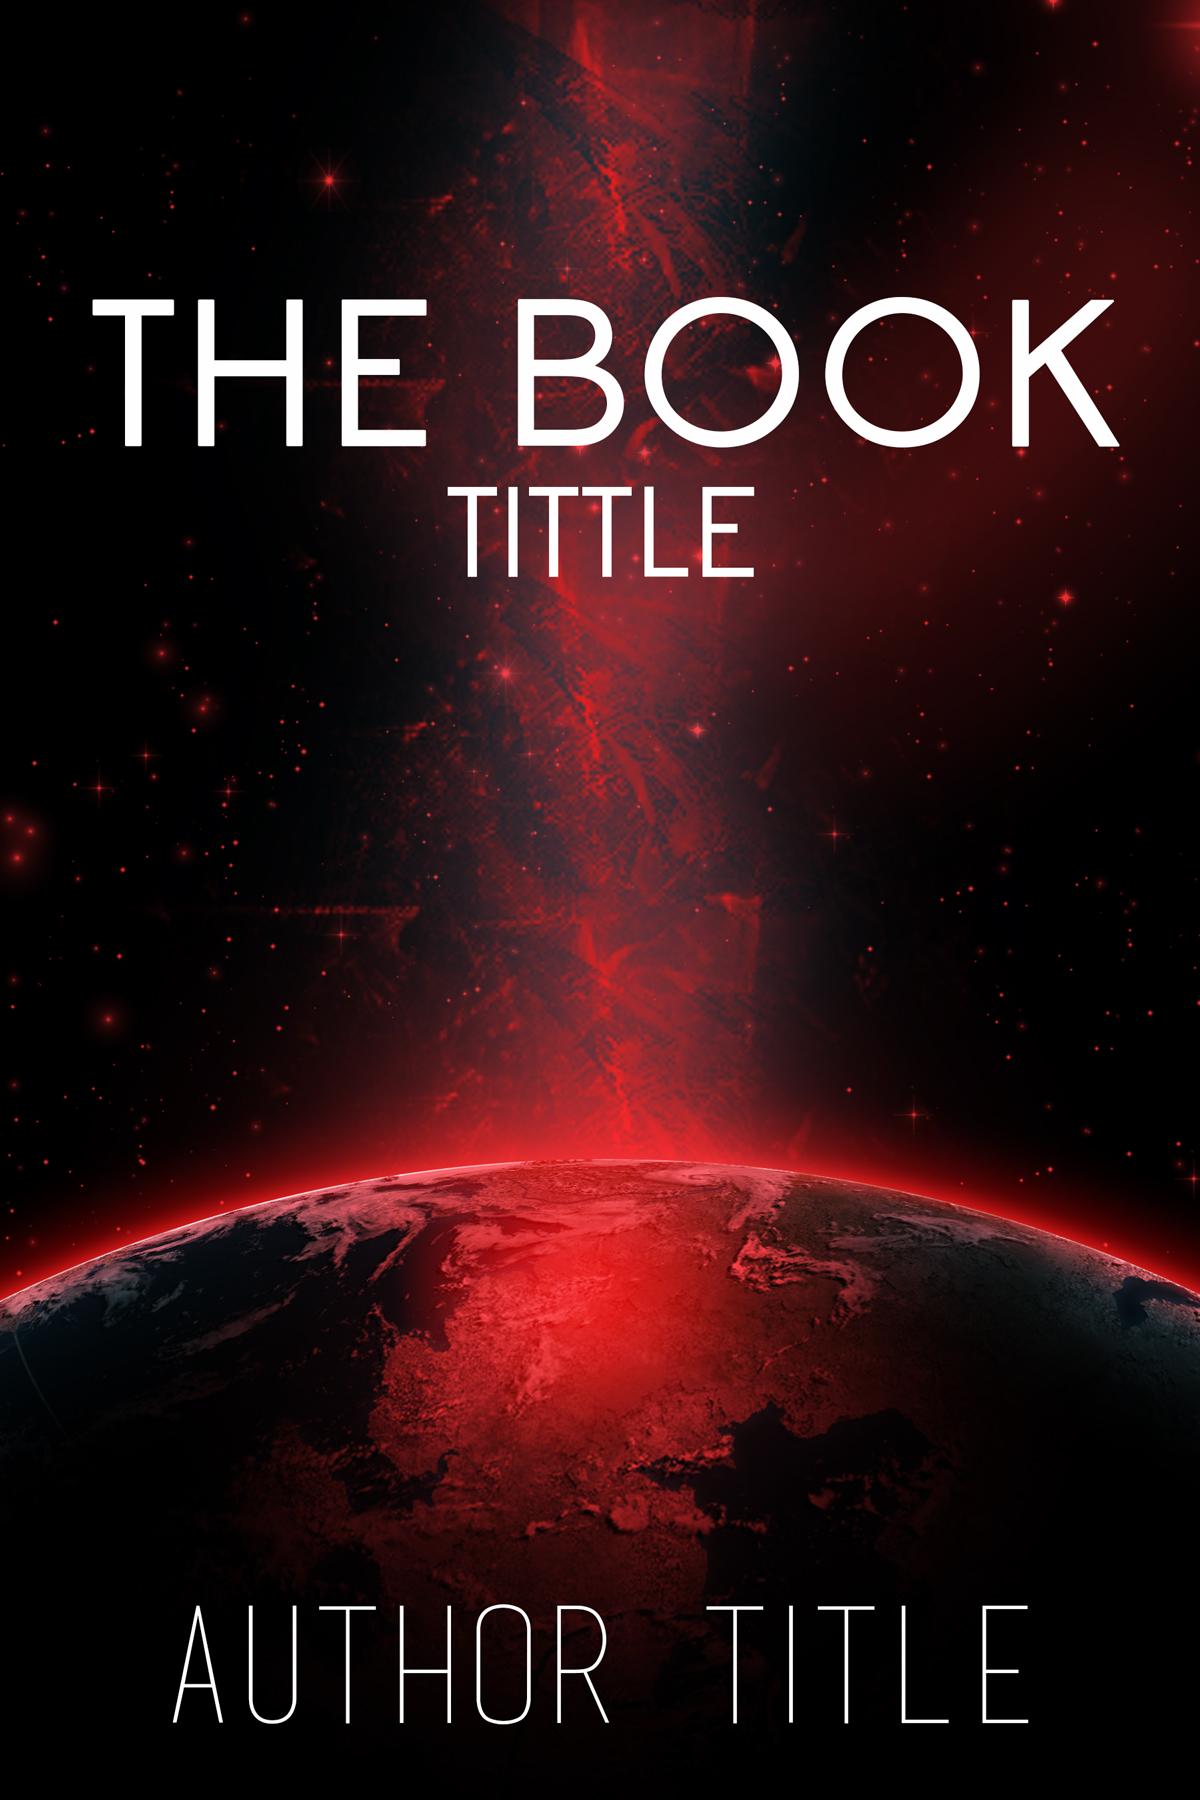 Red Book Cover Design ~ Sci fi book cover red the designer